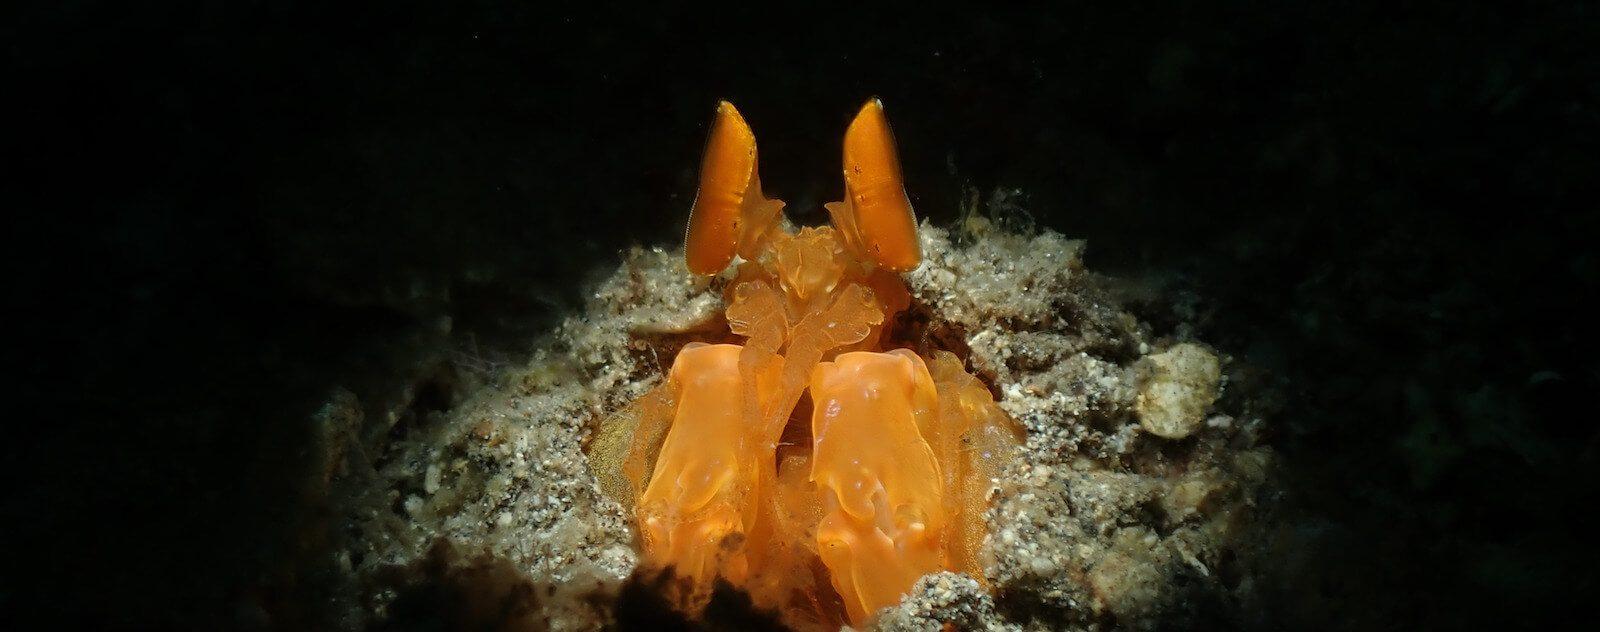 Golden Mantis - Lysiosquilloides mapia